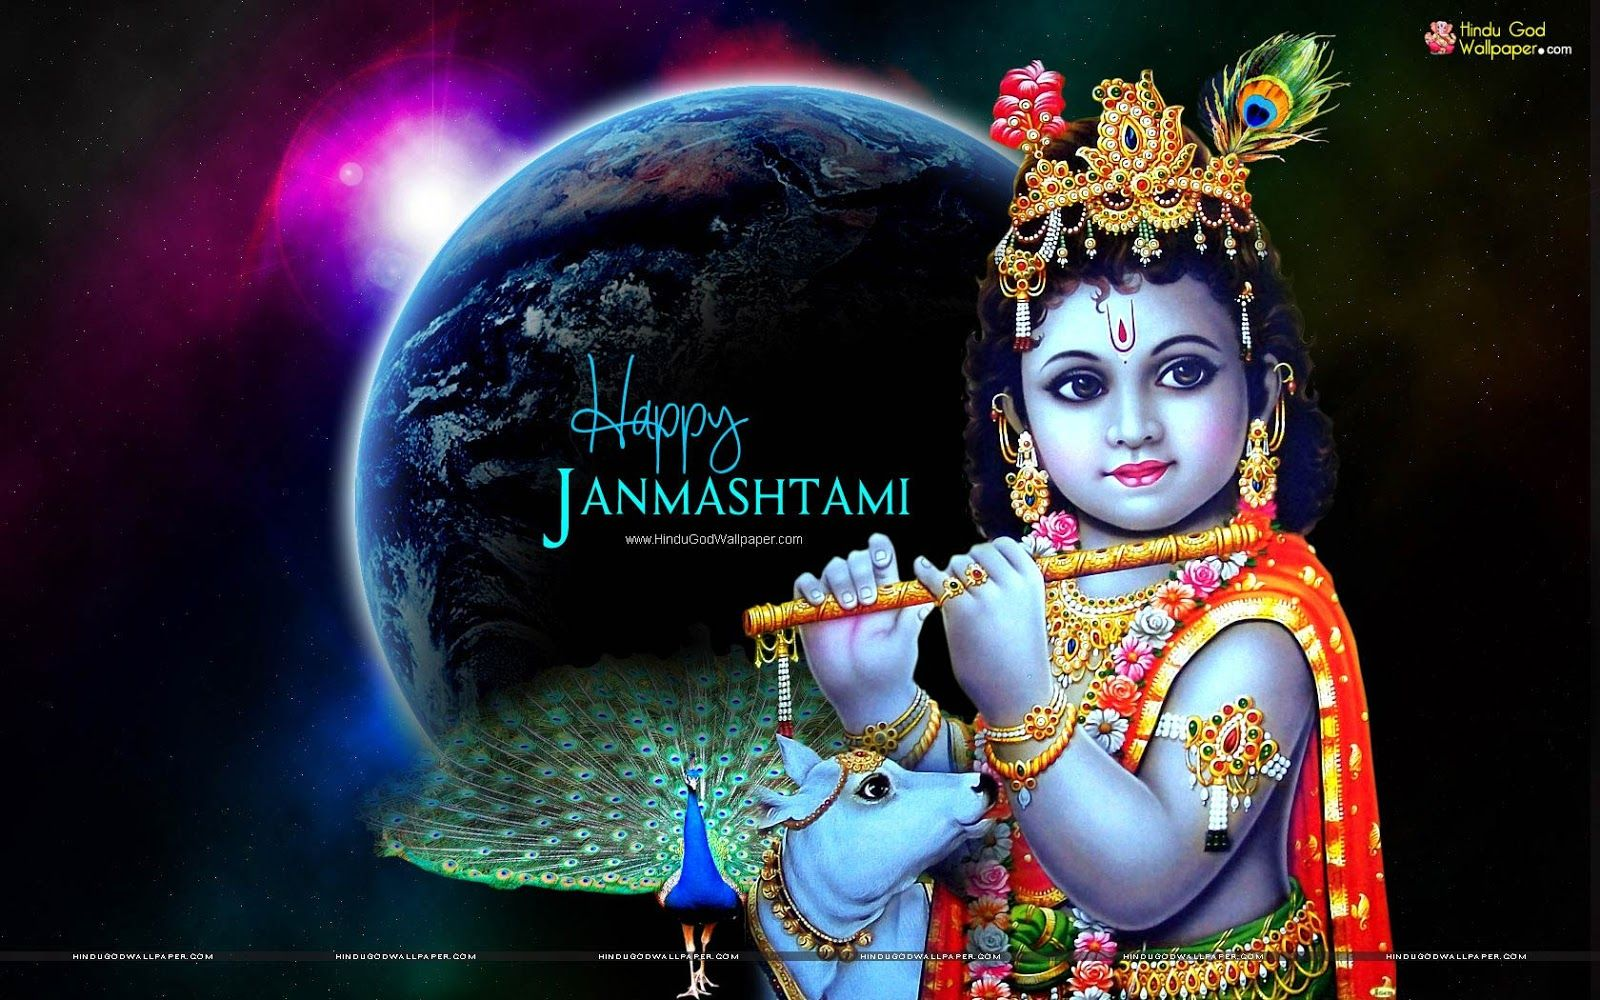 Wallpaper download janmashtami - Best Happy Krishna Janmashtami Wallpapers Free Download